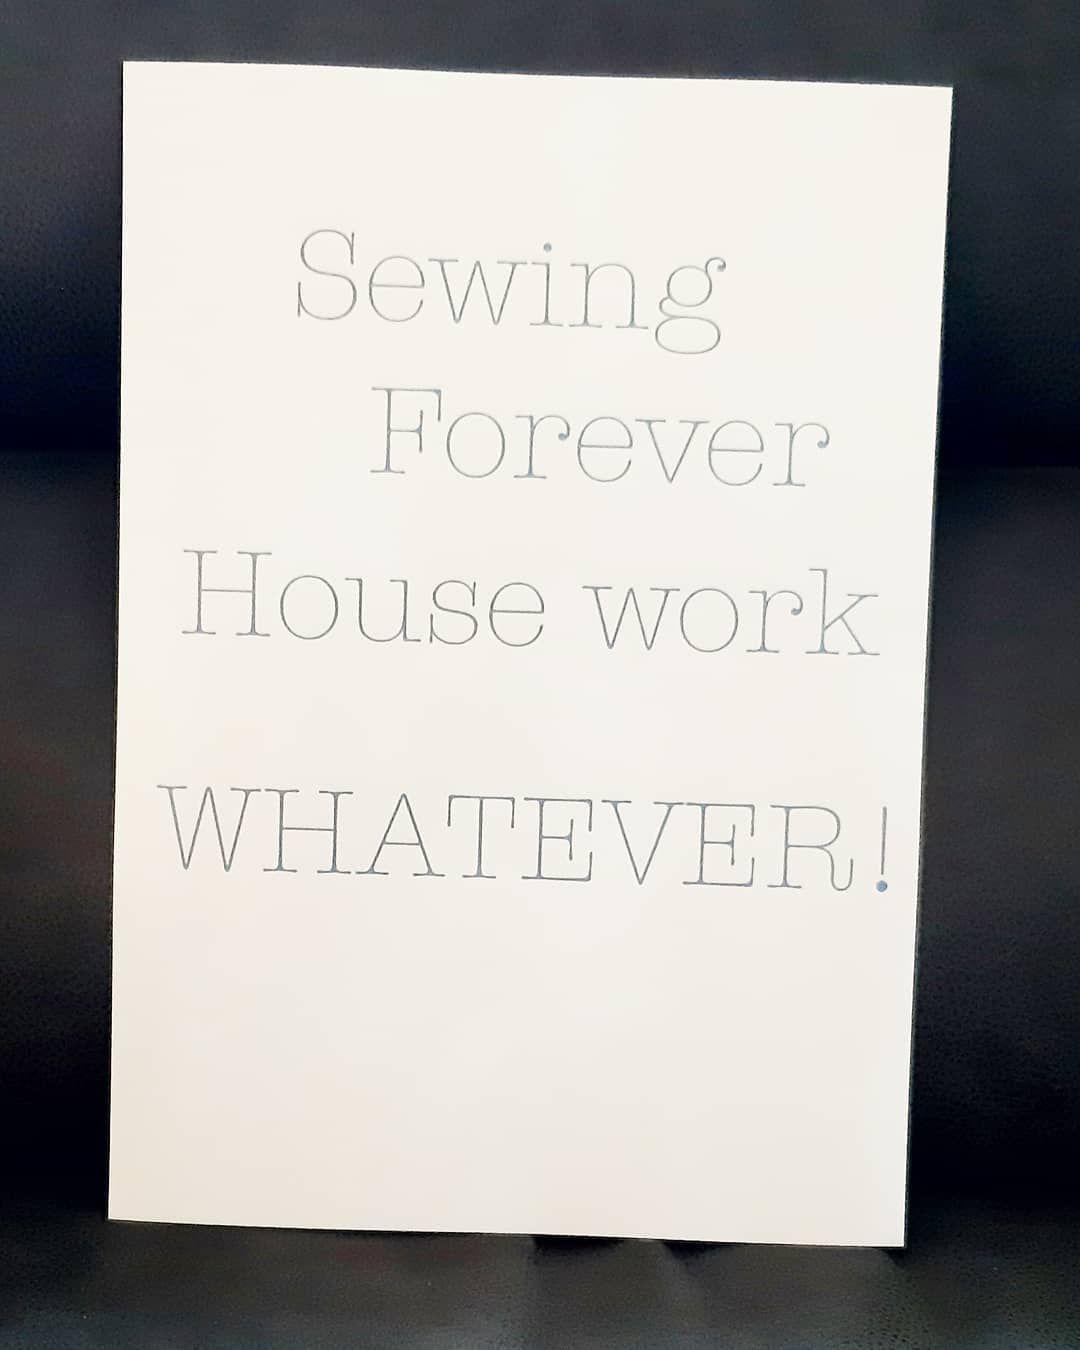 🧶🧵 #sewing #crafts #housework #prints #smallbusiness #whatever #homedecor #homedecor #black #white